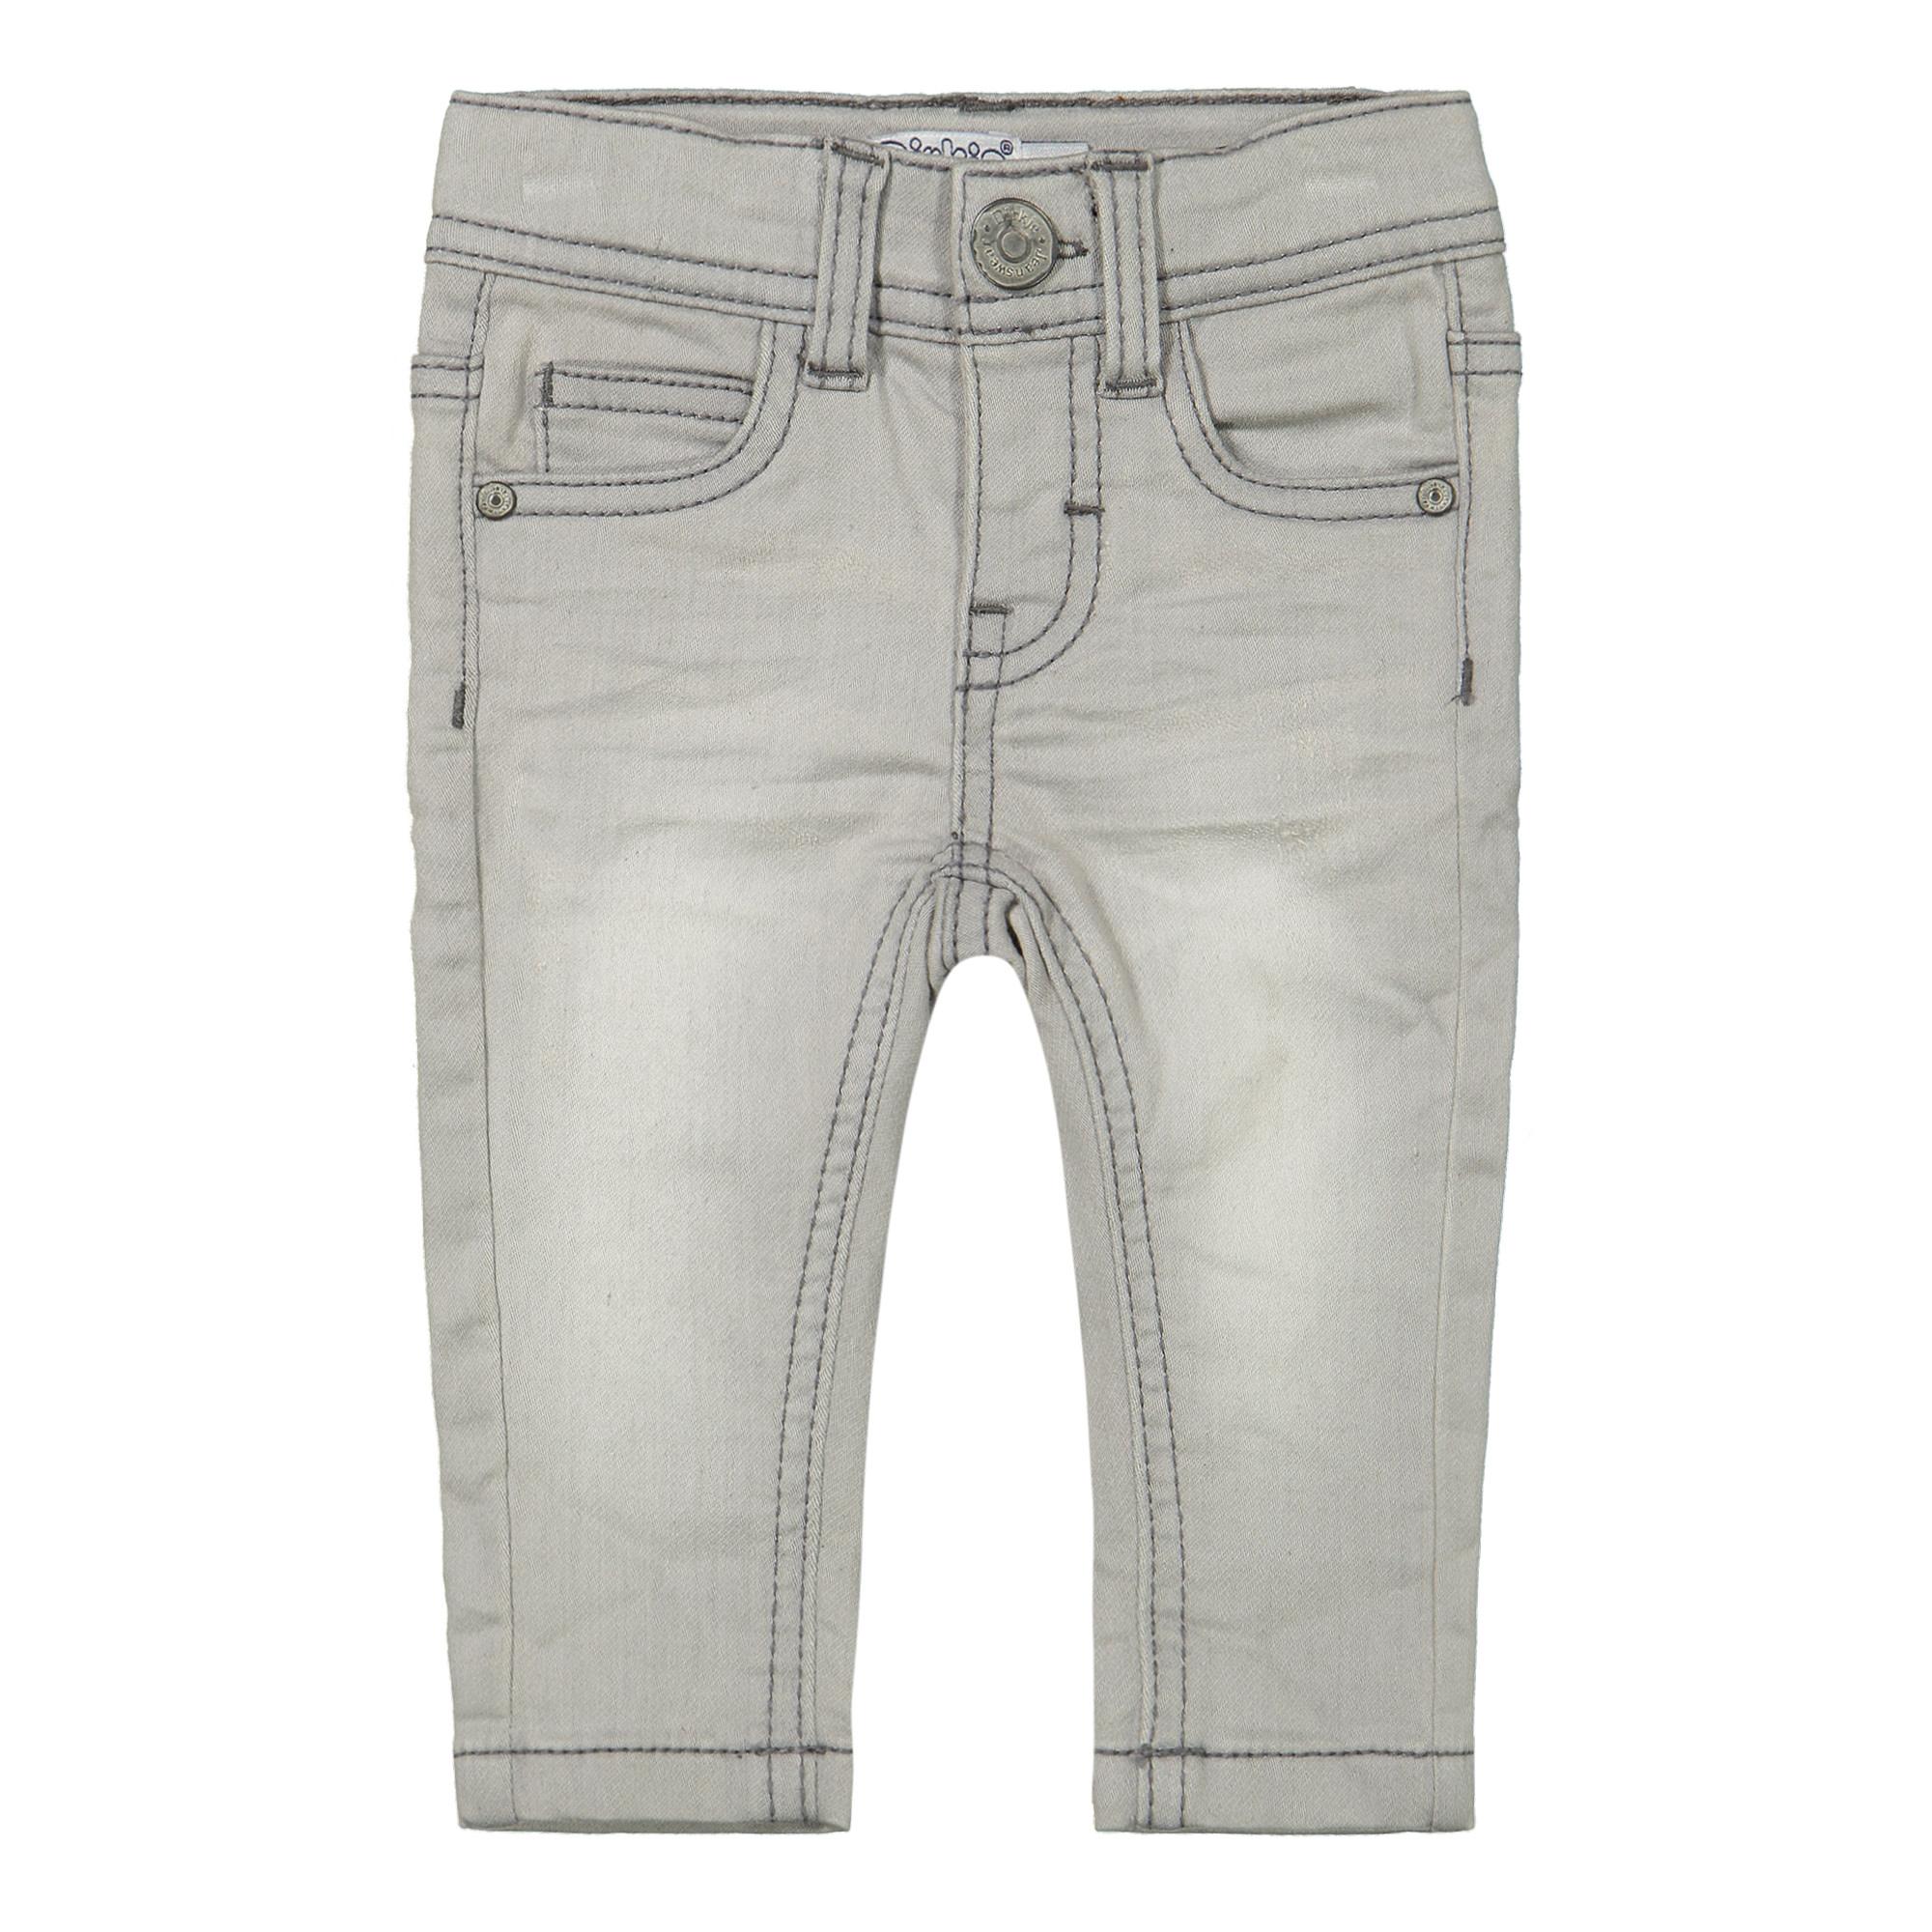 Light Grey Jeans